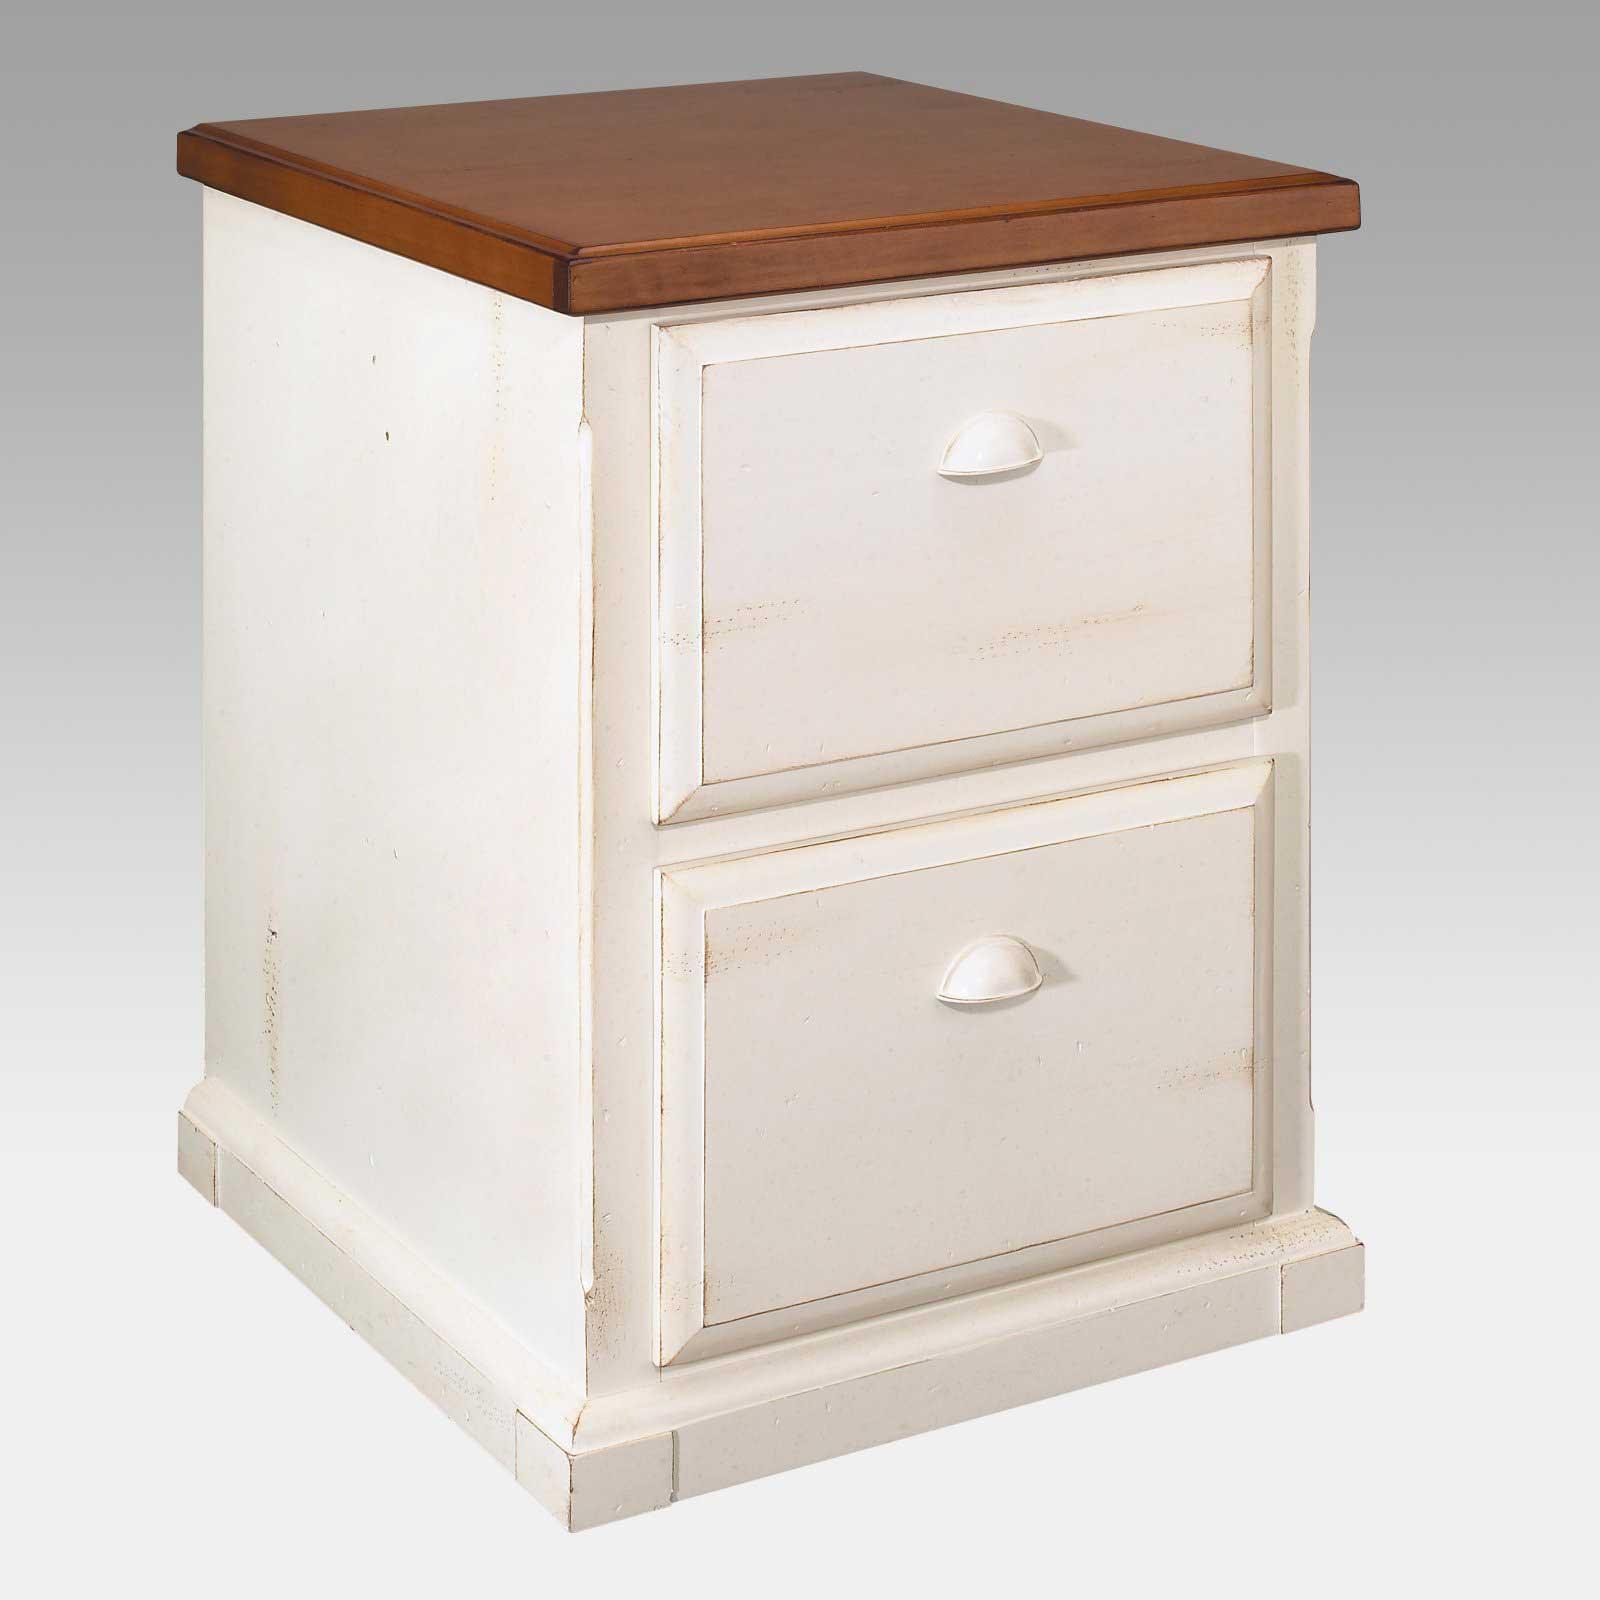 Wood Filing Cabinet Plans